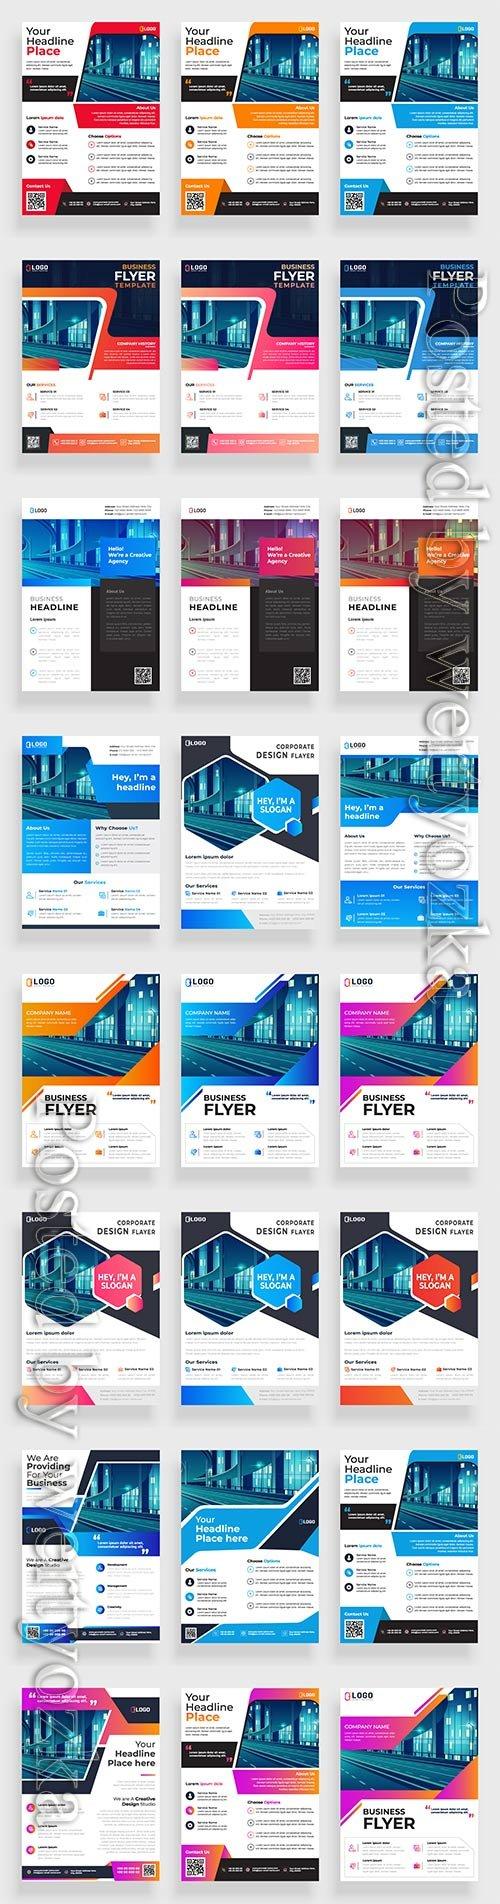 Business flyer template design, brochure vector illustration # 9